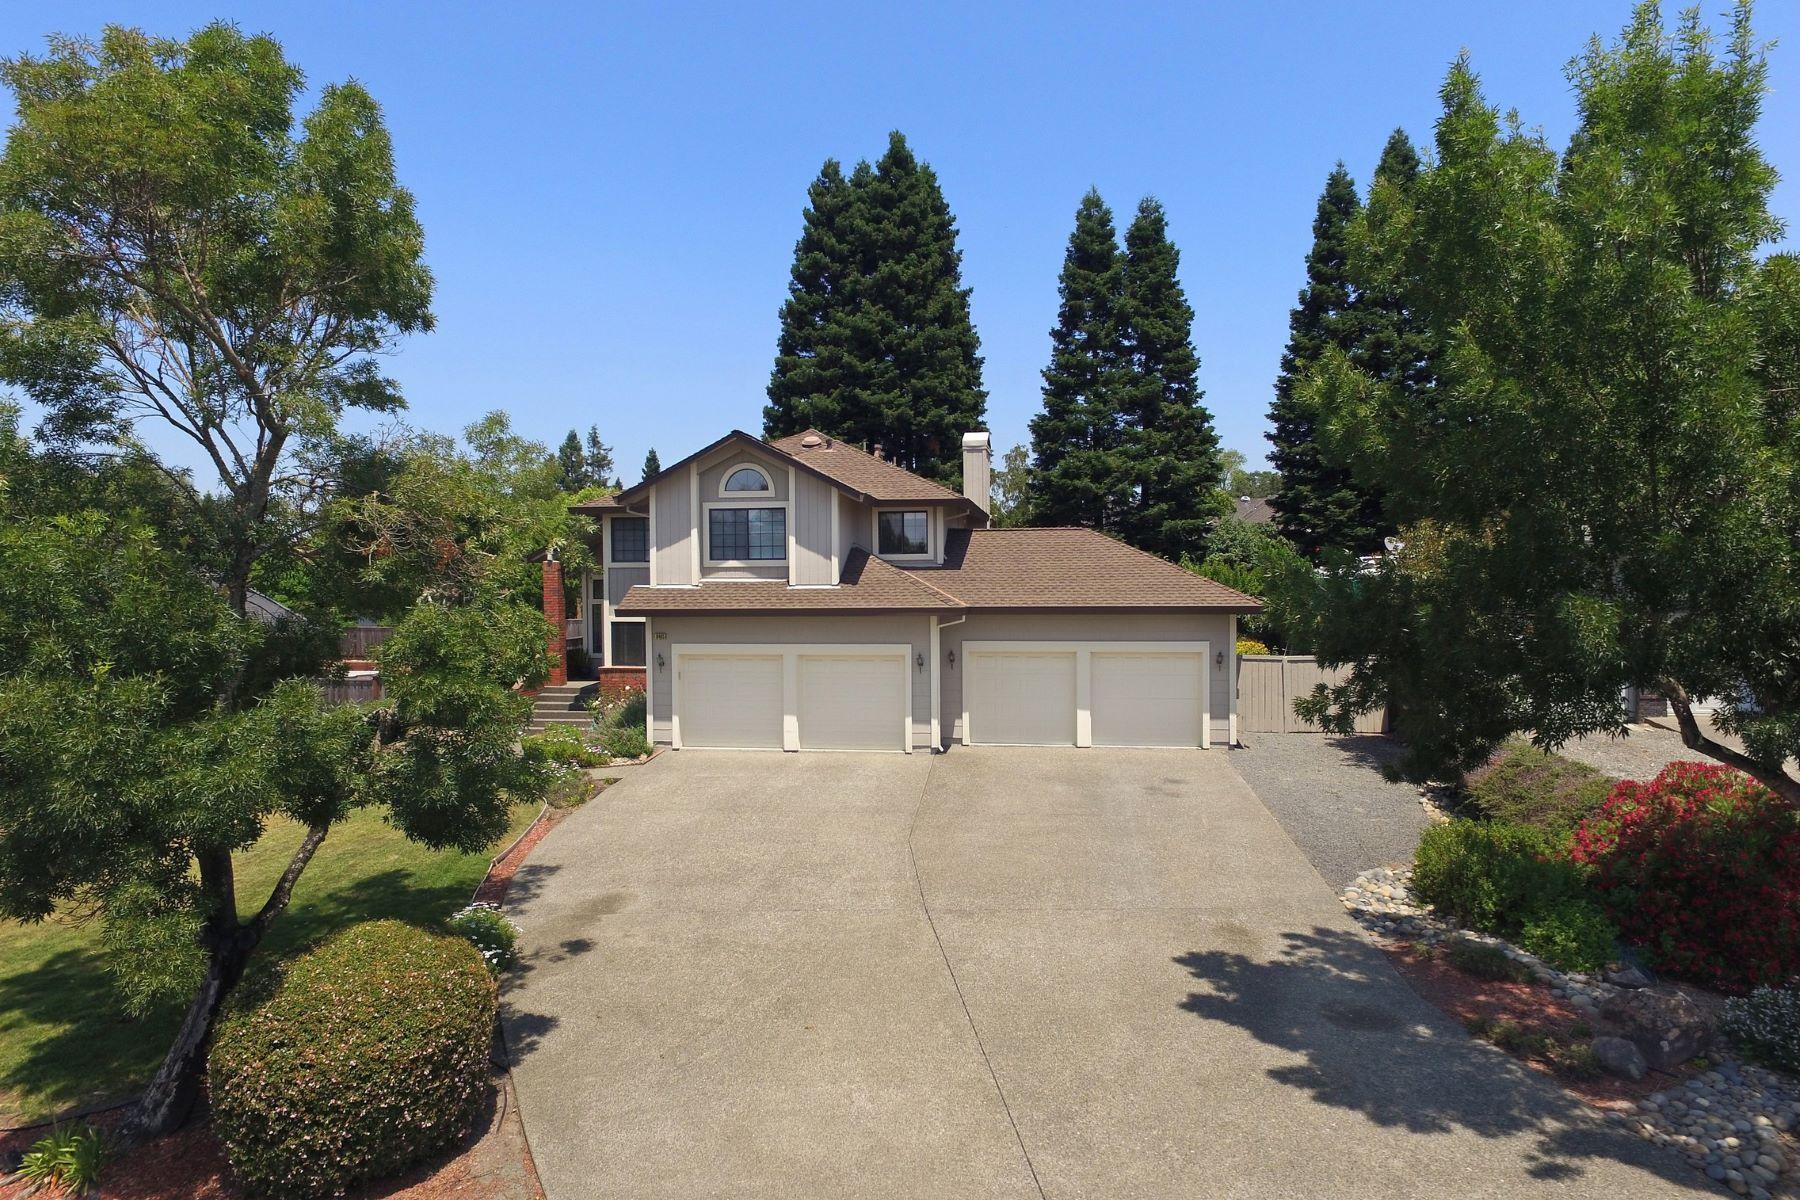 Single Family Homes for Sale at Vinecrest Estates 9465 Vinecrest Road Windsor, California 95492 United States